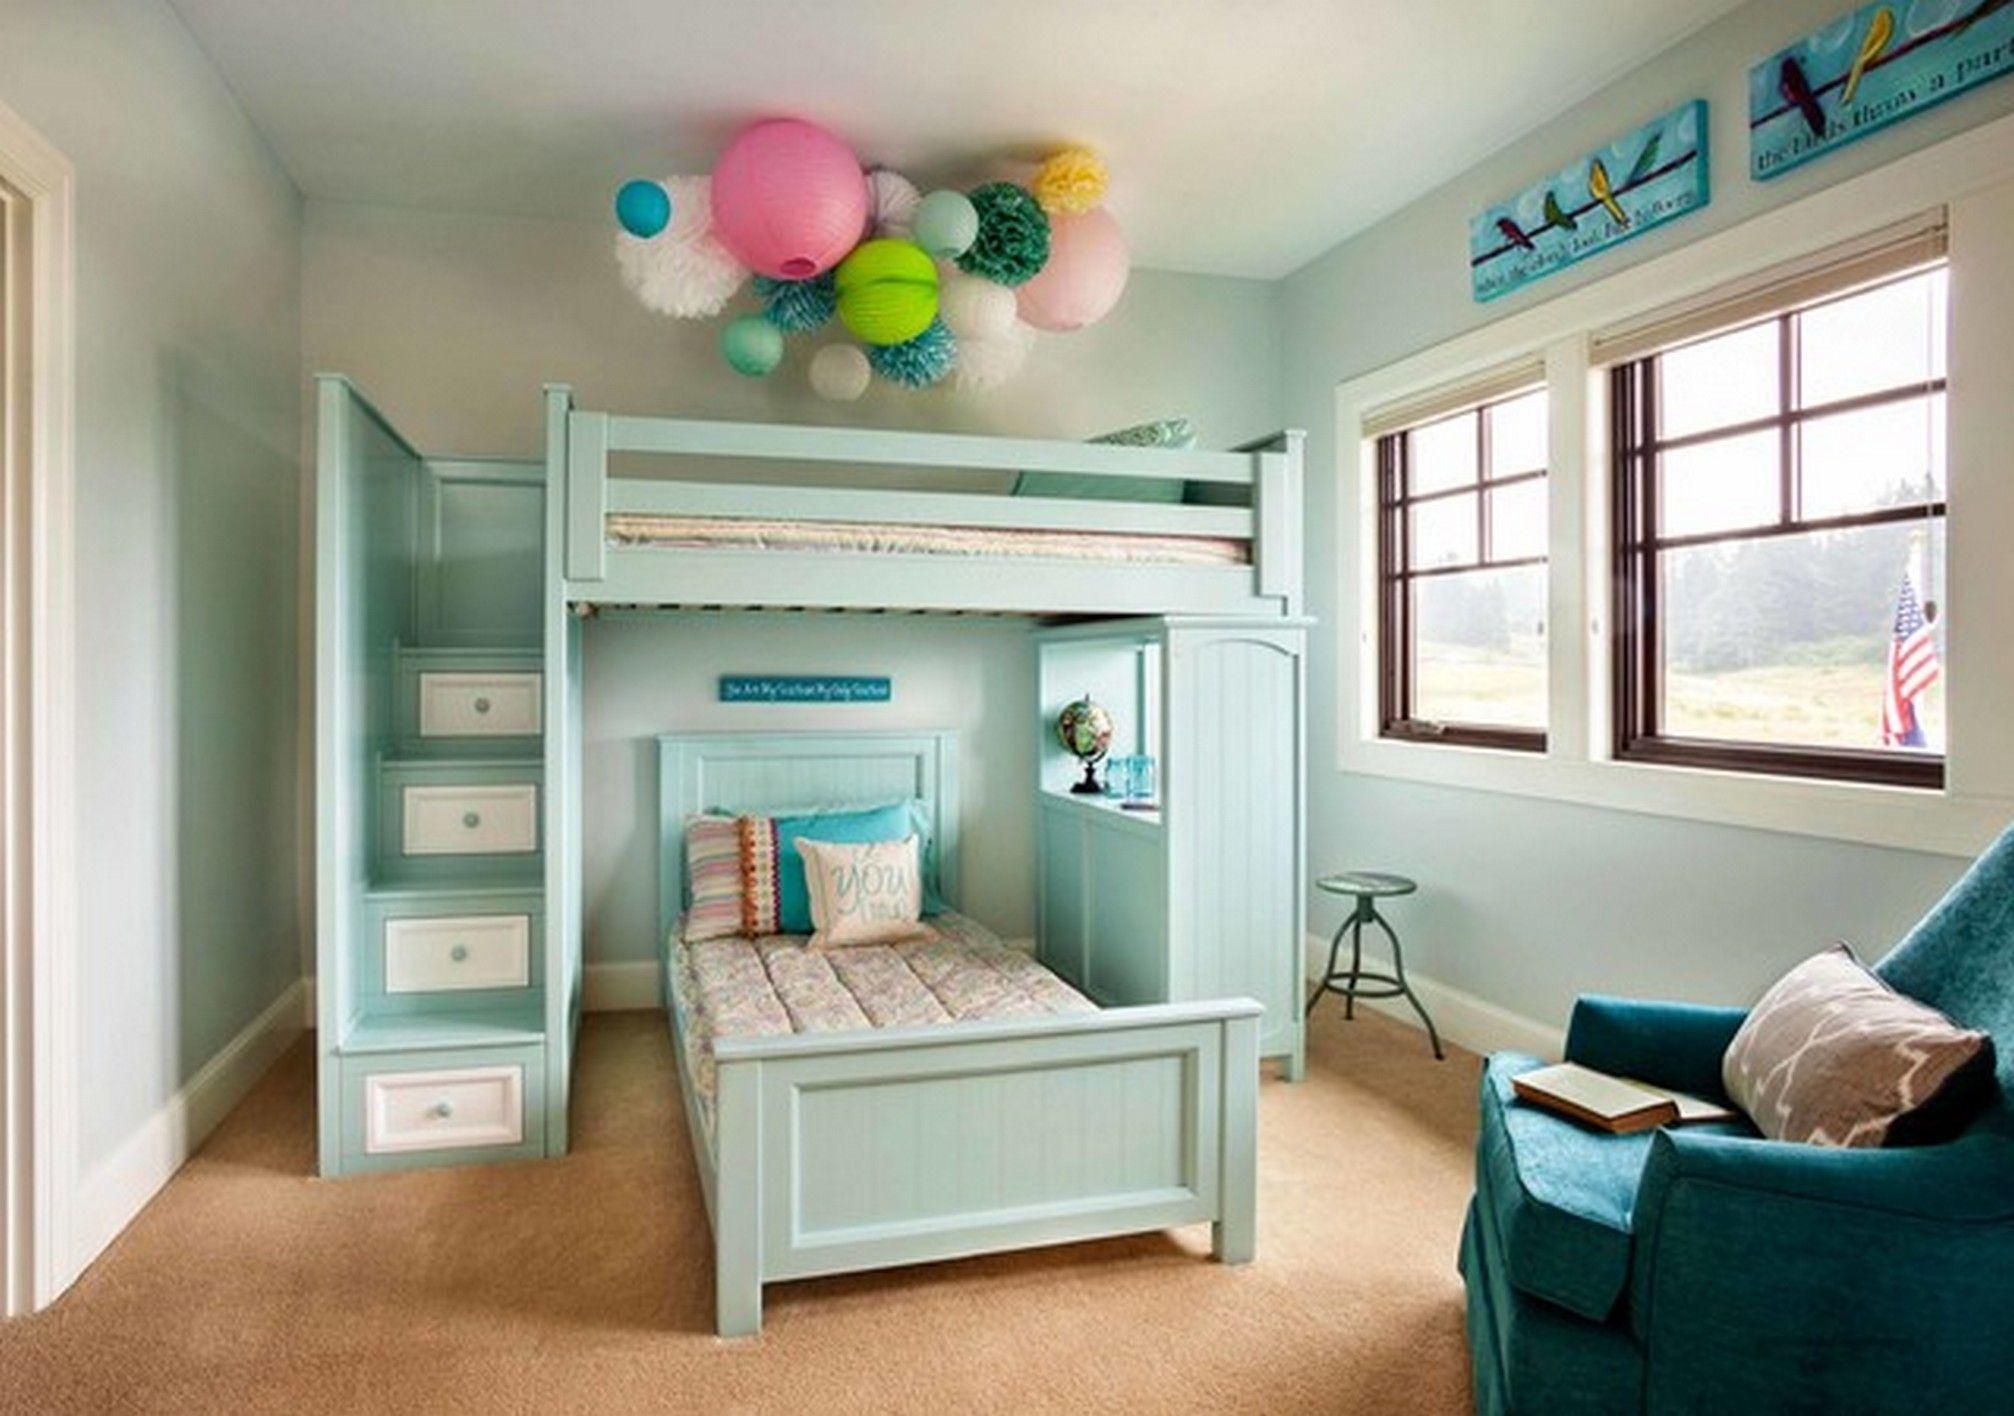 Loft bed ideas boys  Found on Bing from russwittmann  New house  kidsu rooms